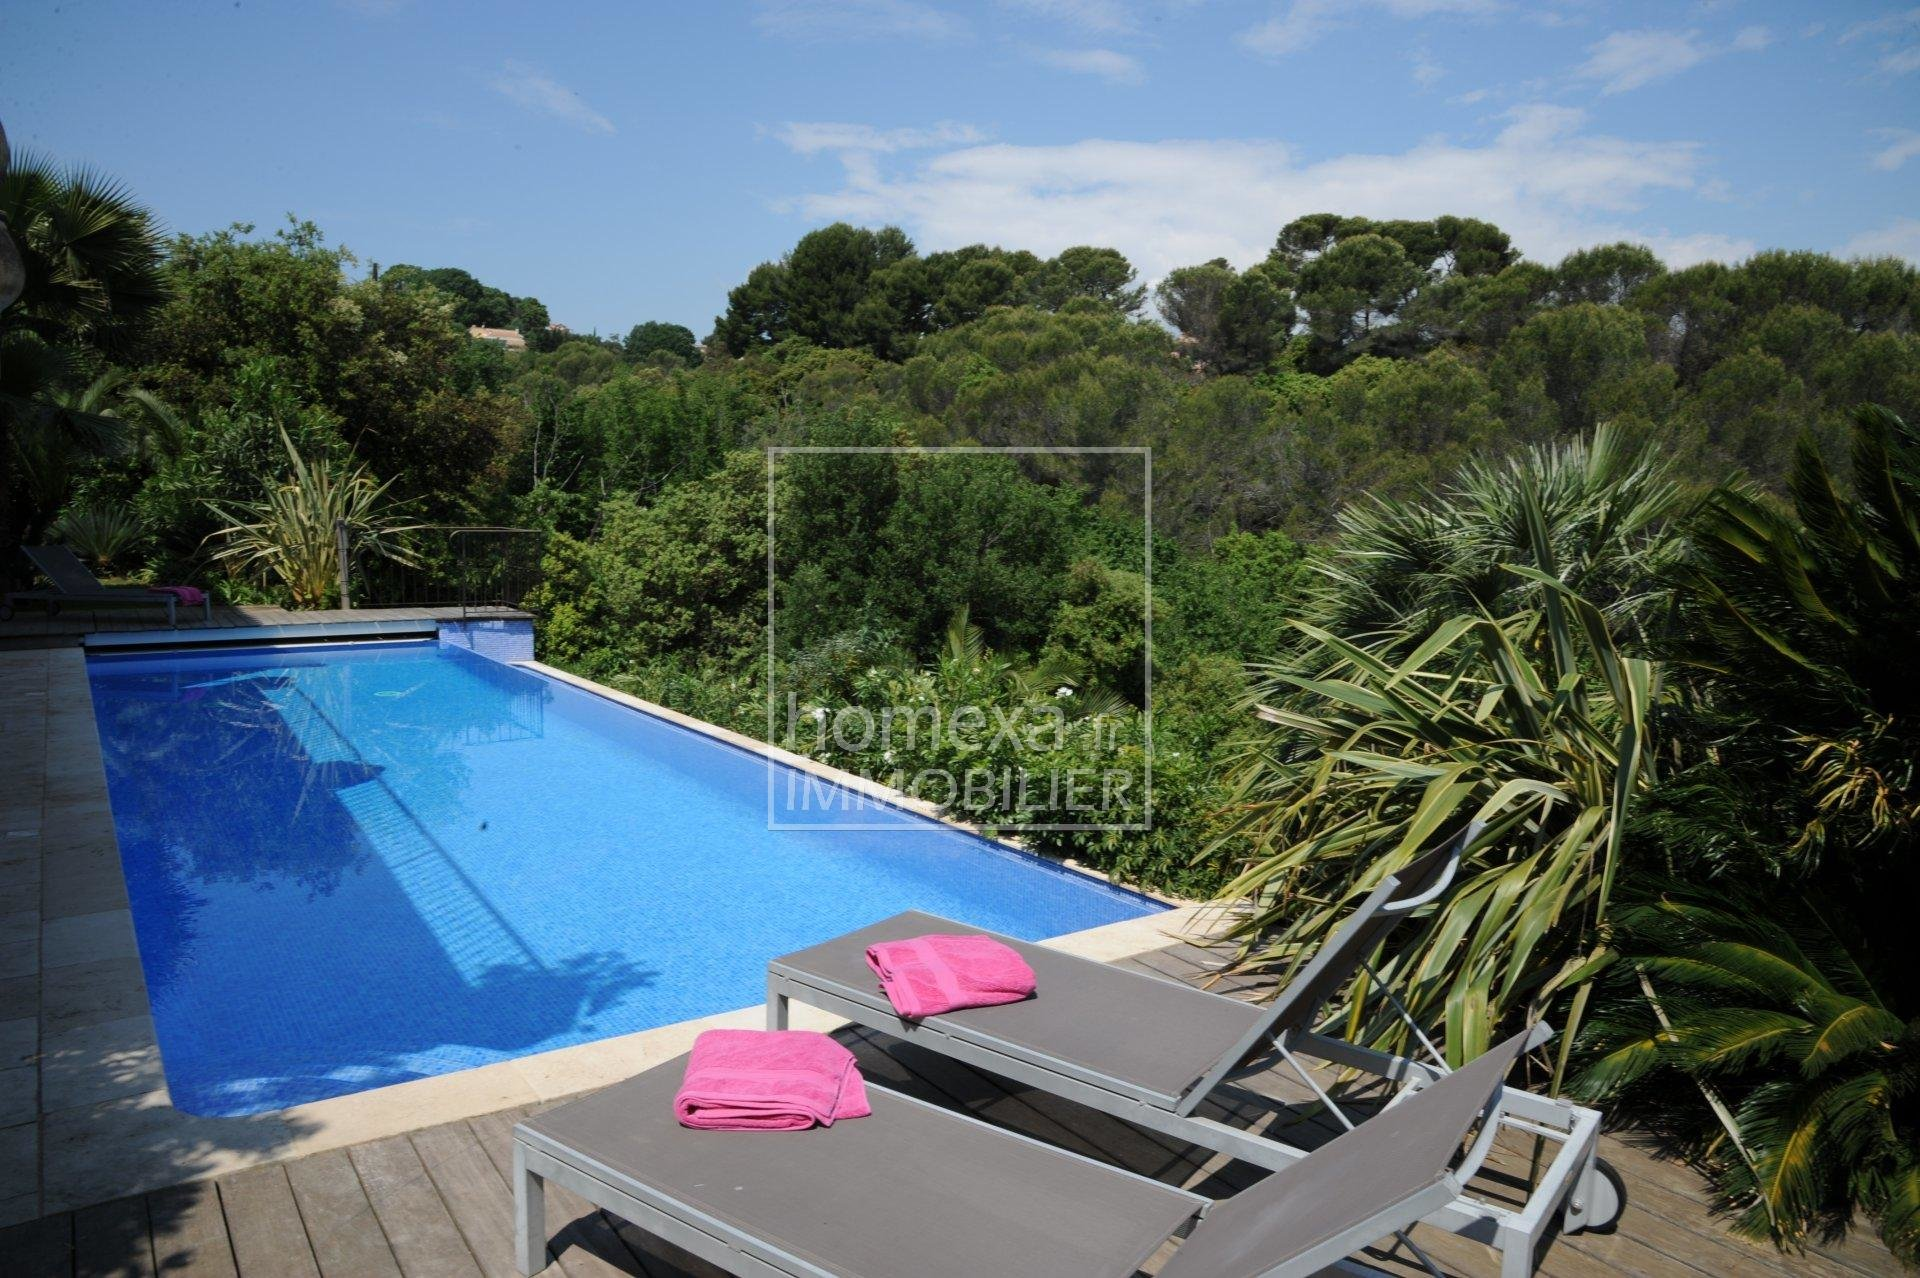 Location villa avec piscine Antibes